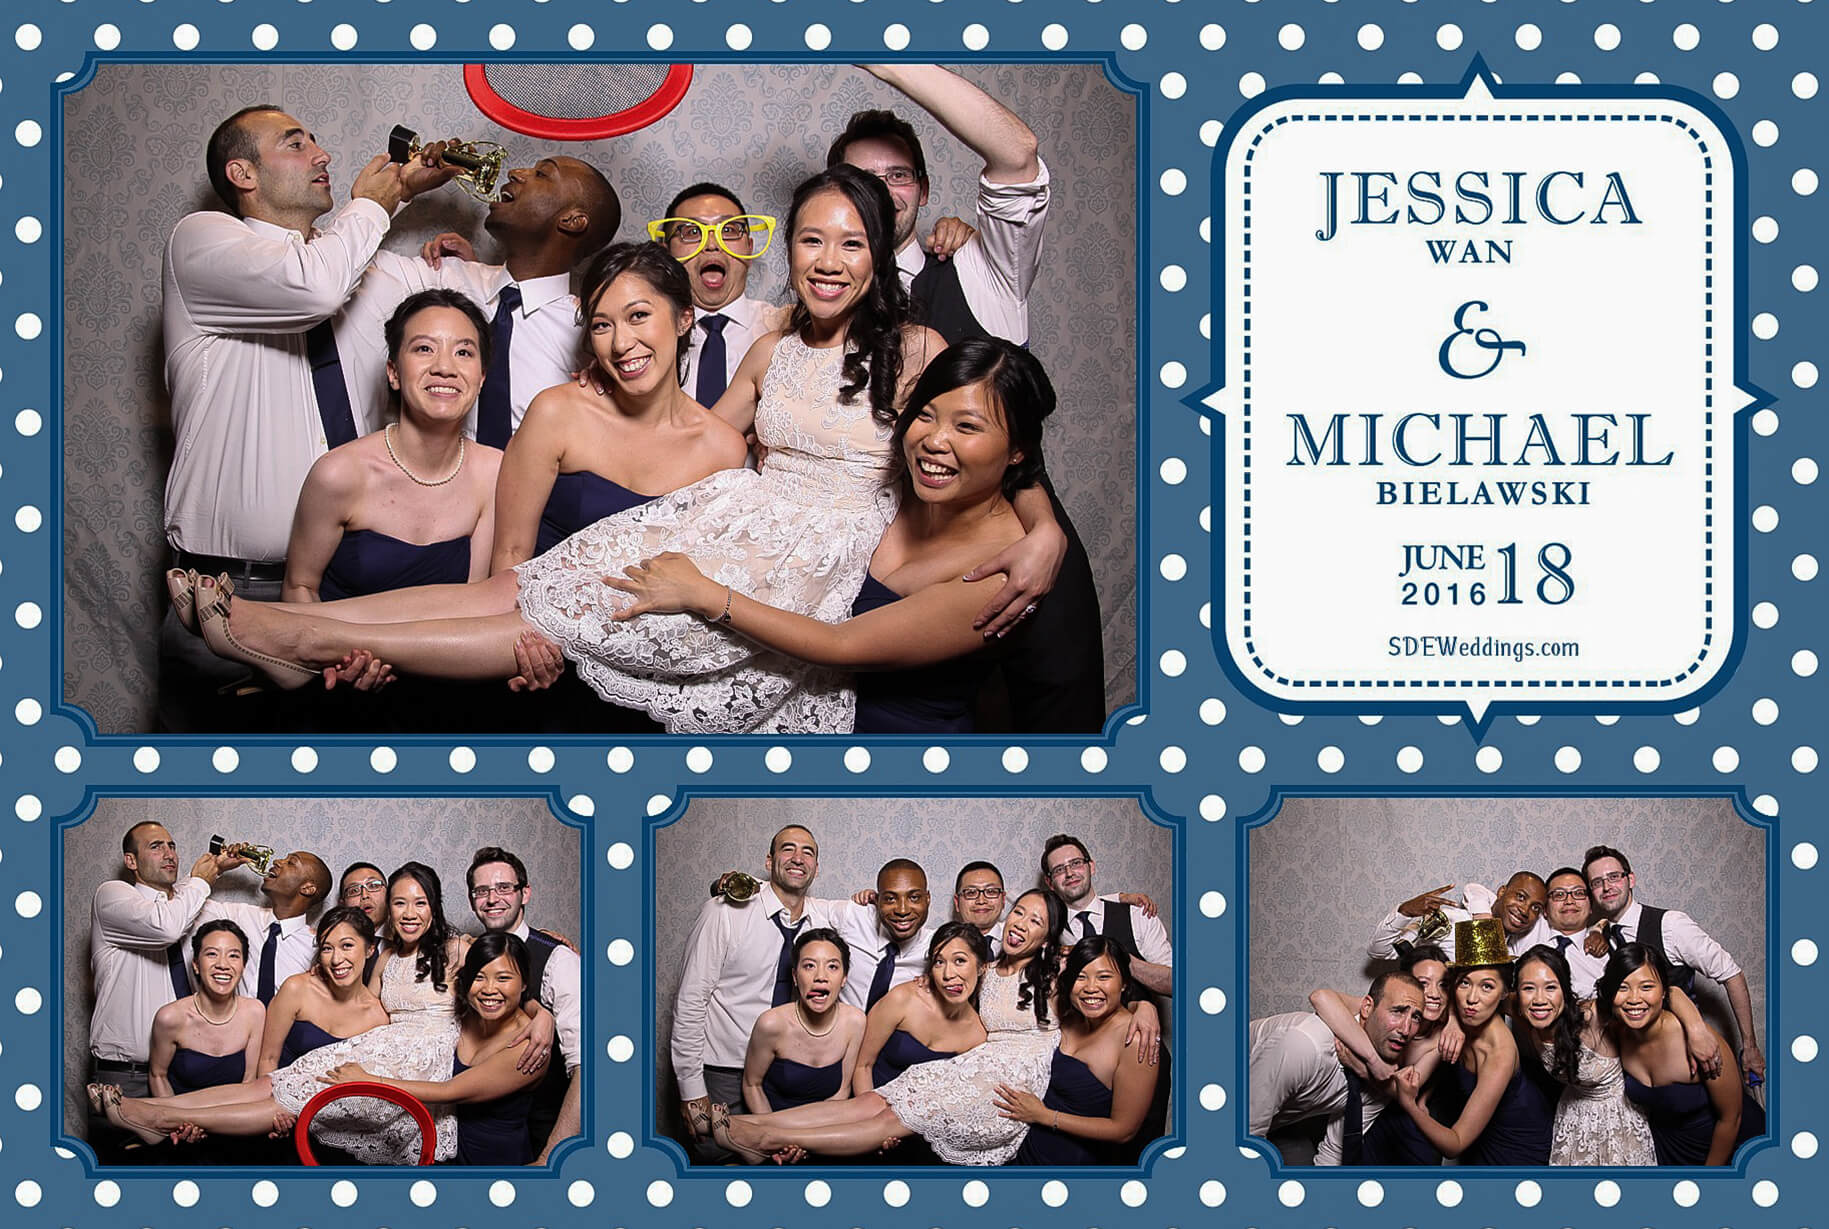 Toronto Photo Booth Rental Company | Weddings & Events | SDE Weddings